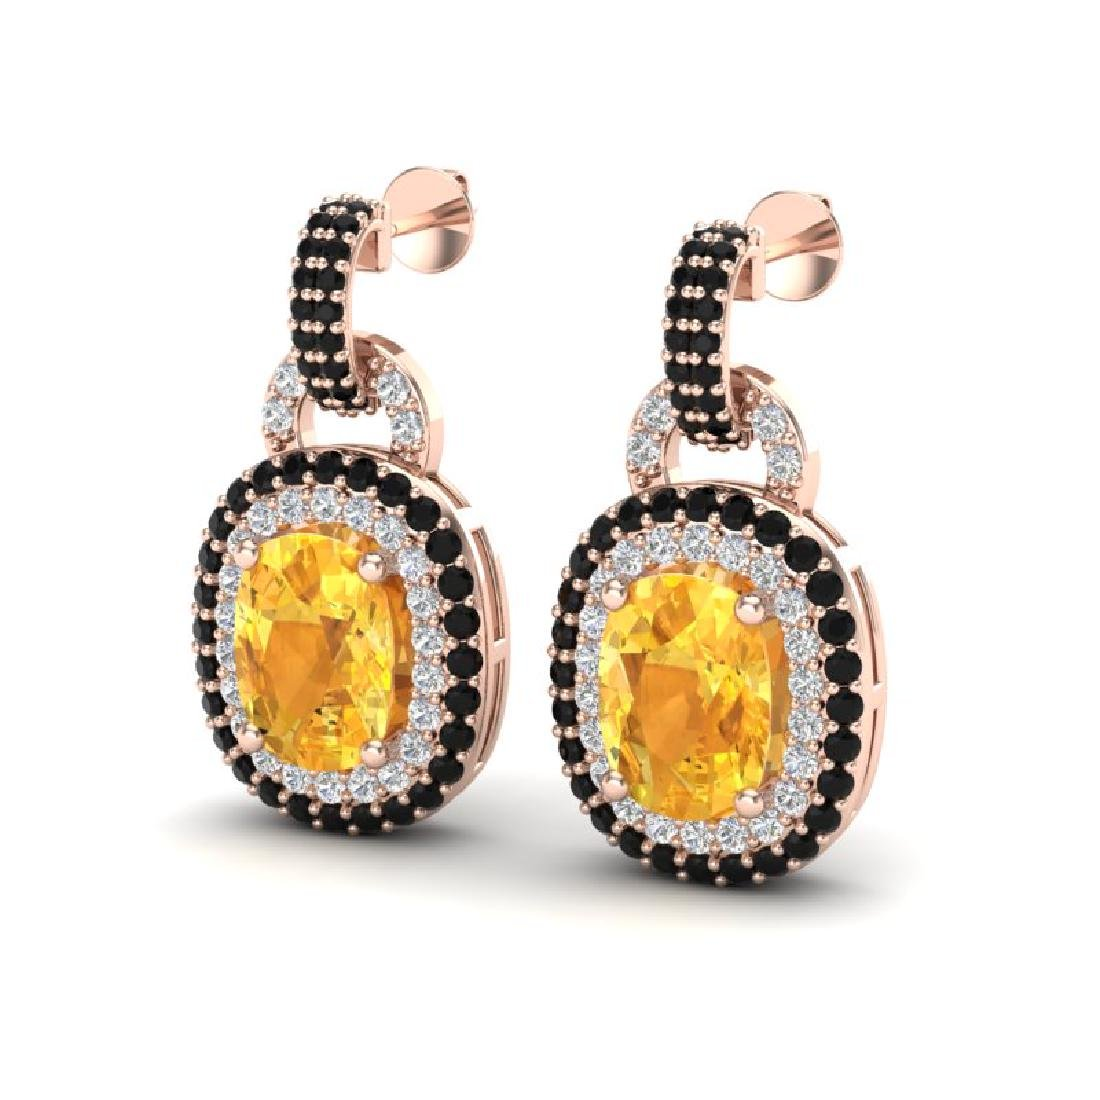 5 CTW Citrine & Black Micro Pave VS/SI Diamond Earrings